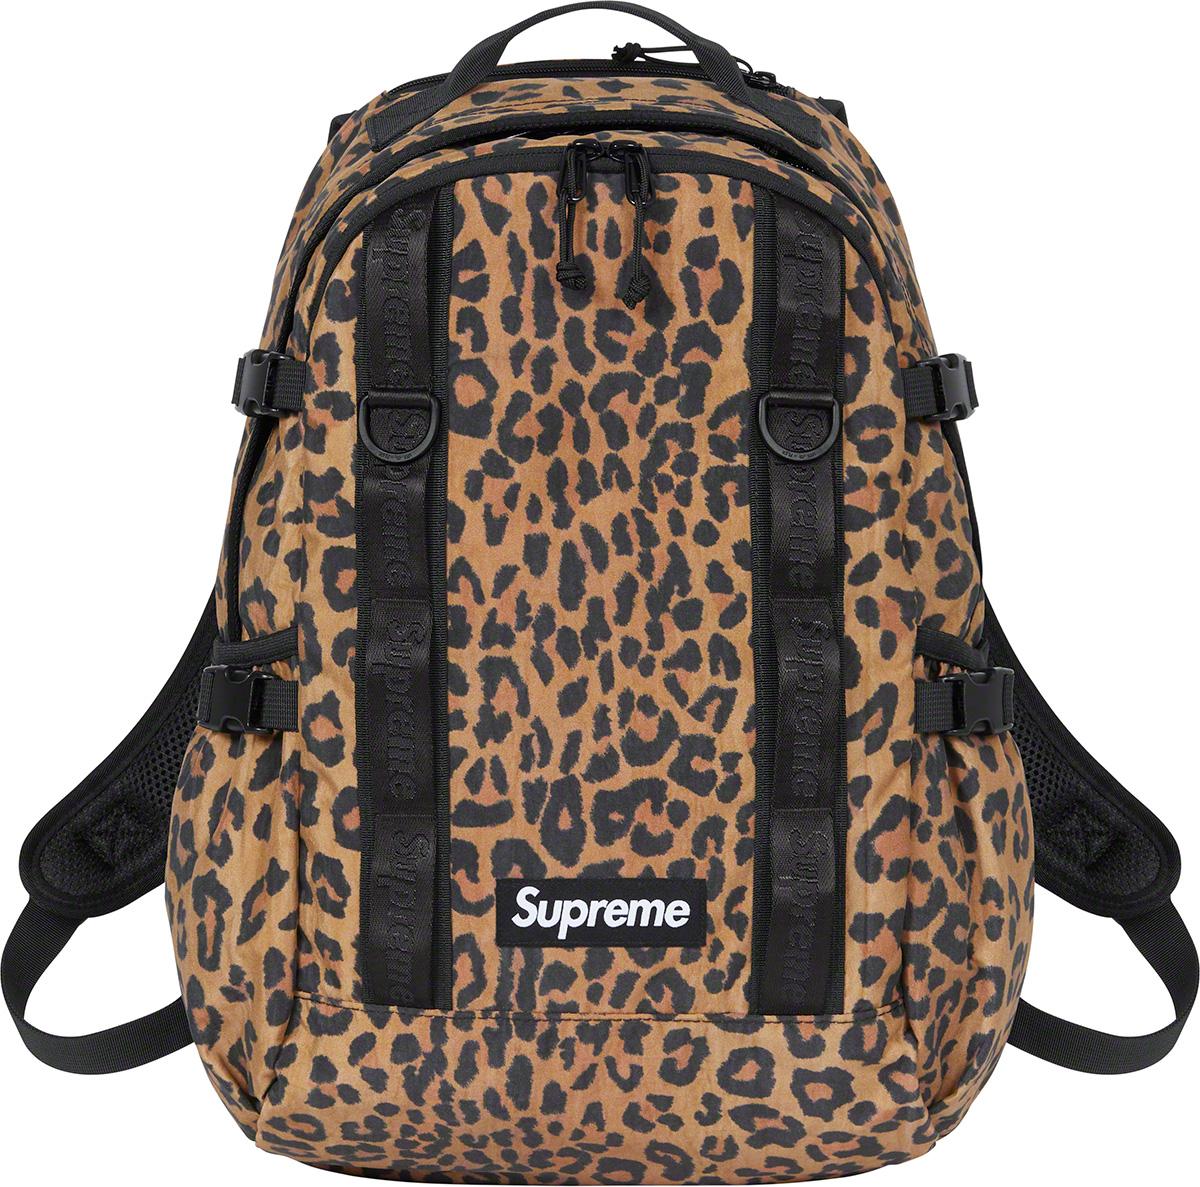 Supreme 2020fw Backpack シュプリーム 2020年秋冬 リュック バックパック ヒョウ柄